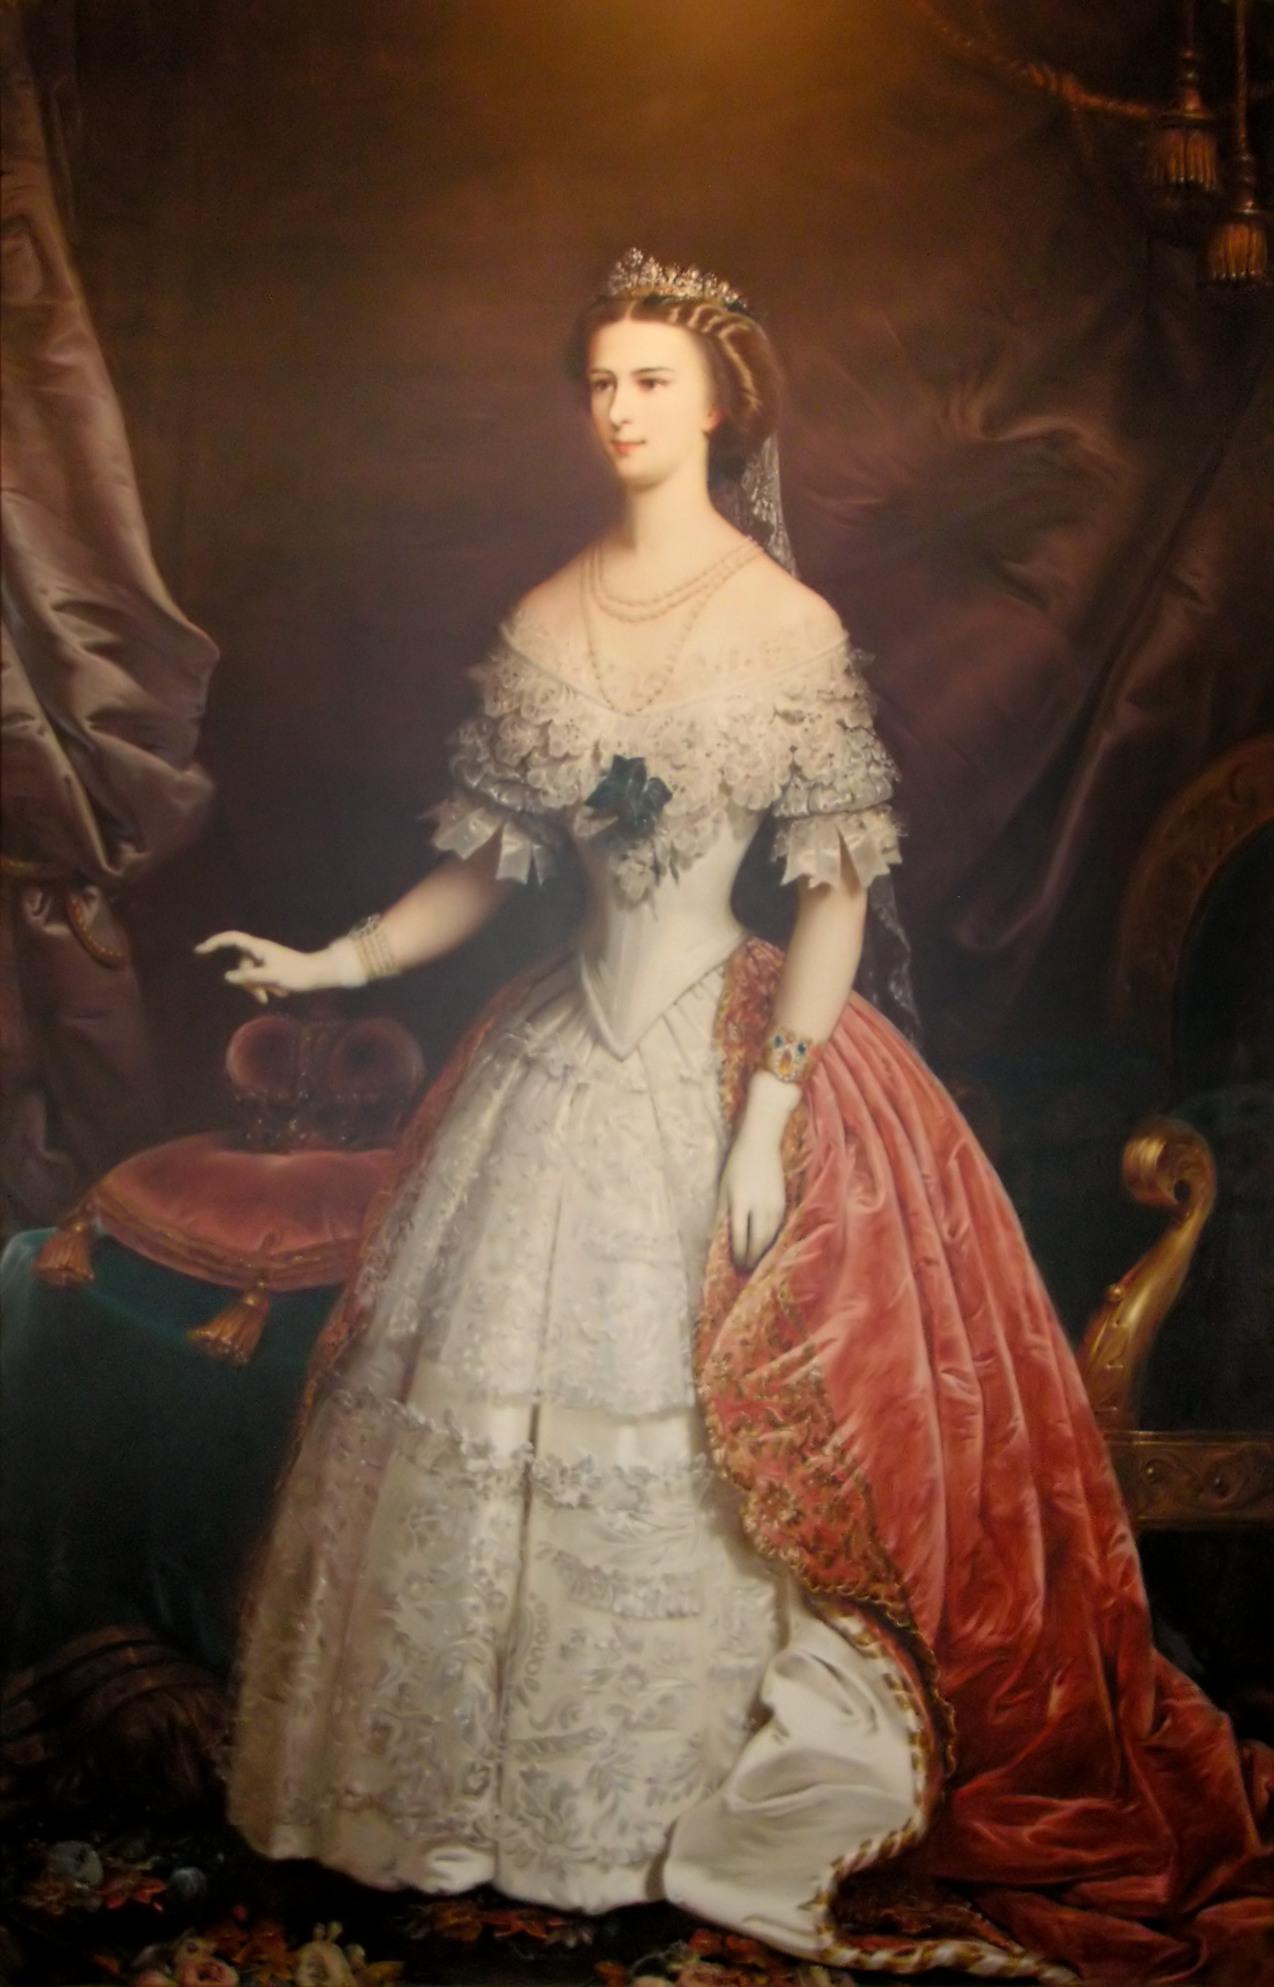 Fateful Years Of An Empress